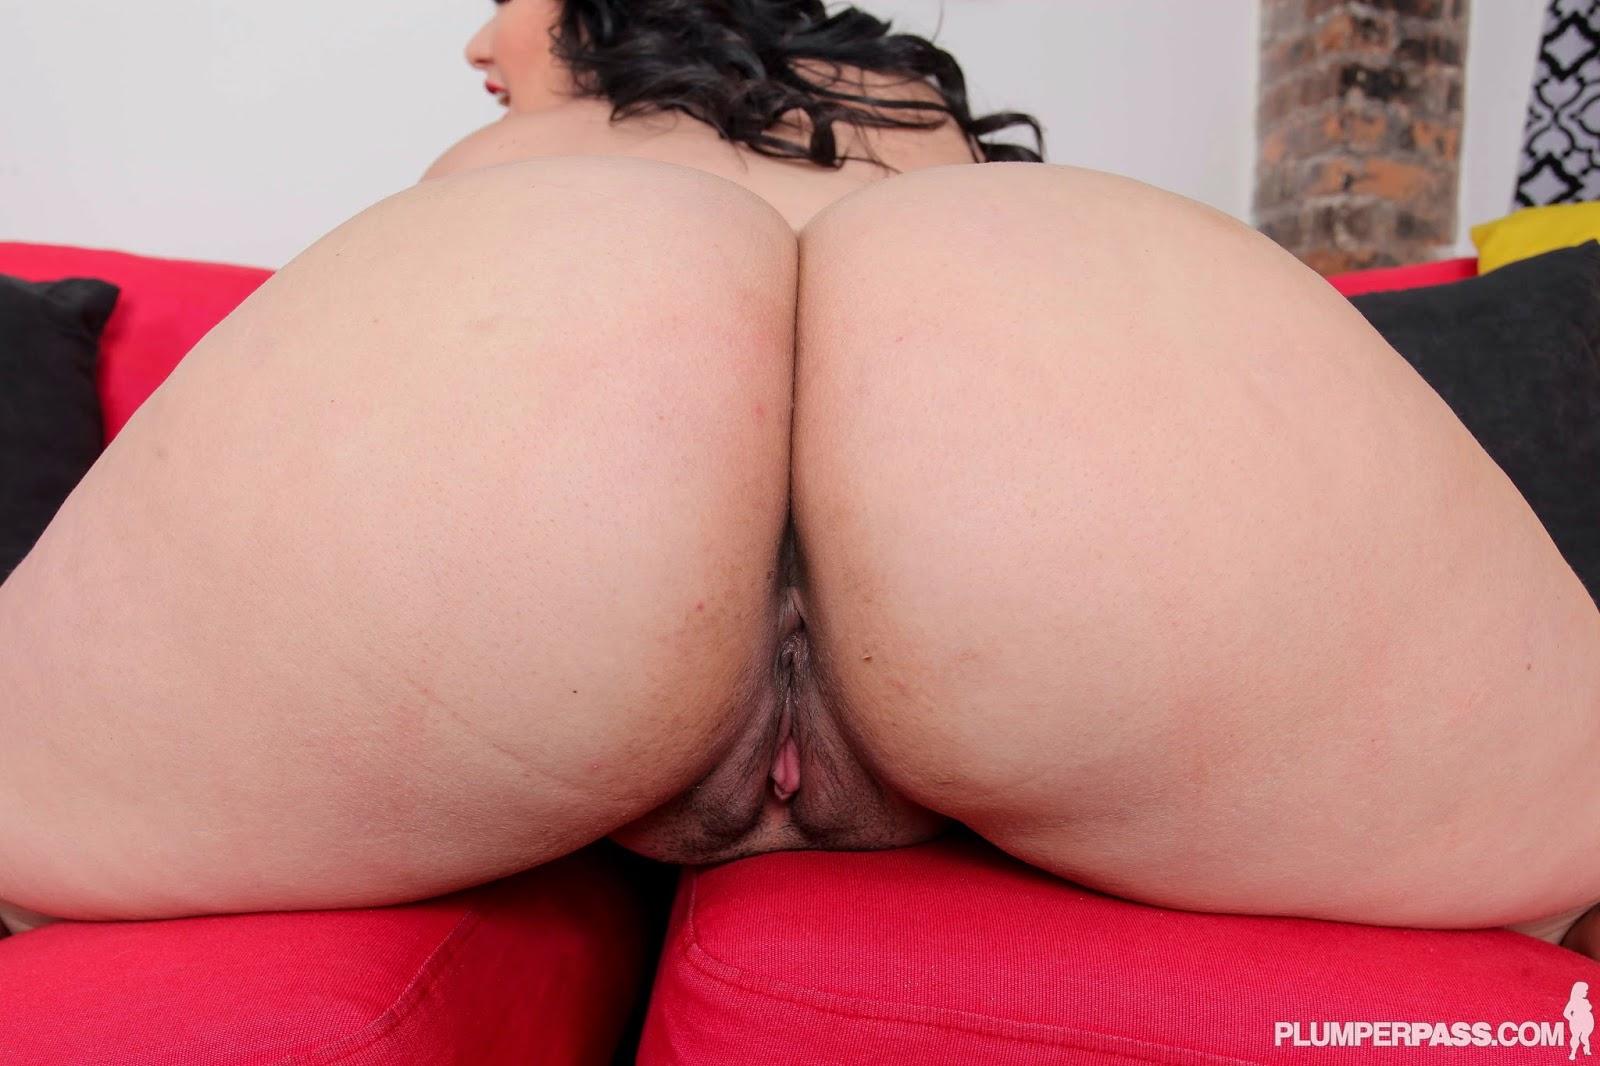 Bbw latina angelina castro rubs cunt with 2 very big girls 3